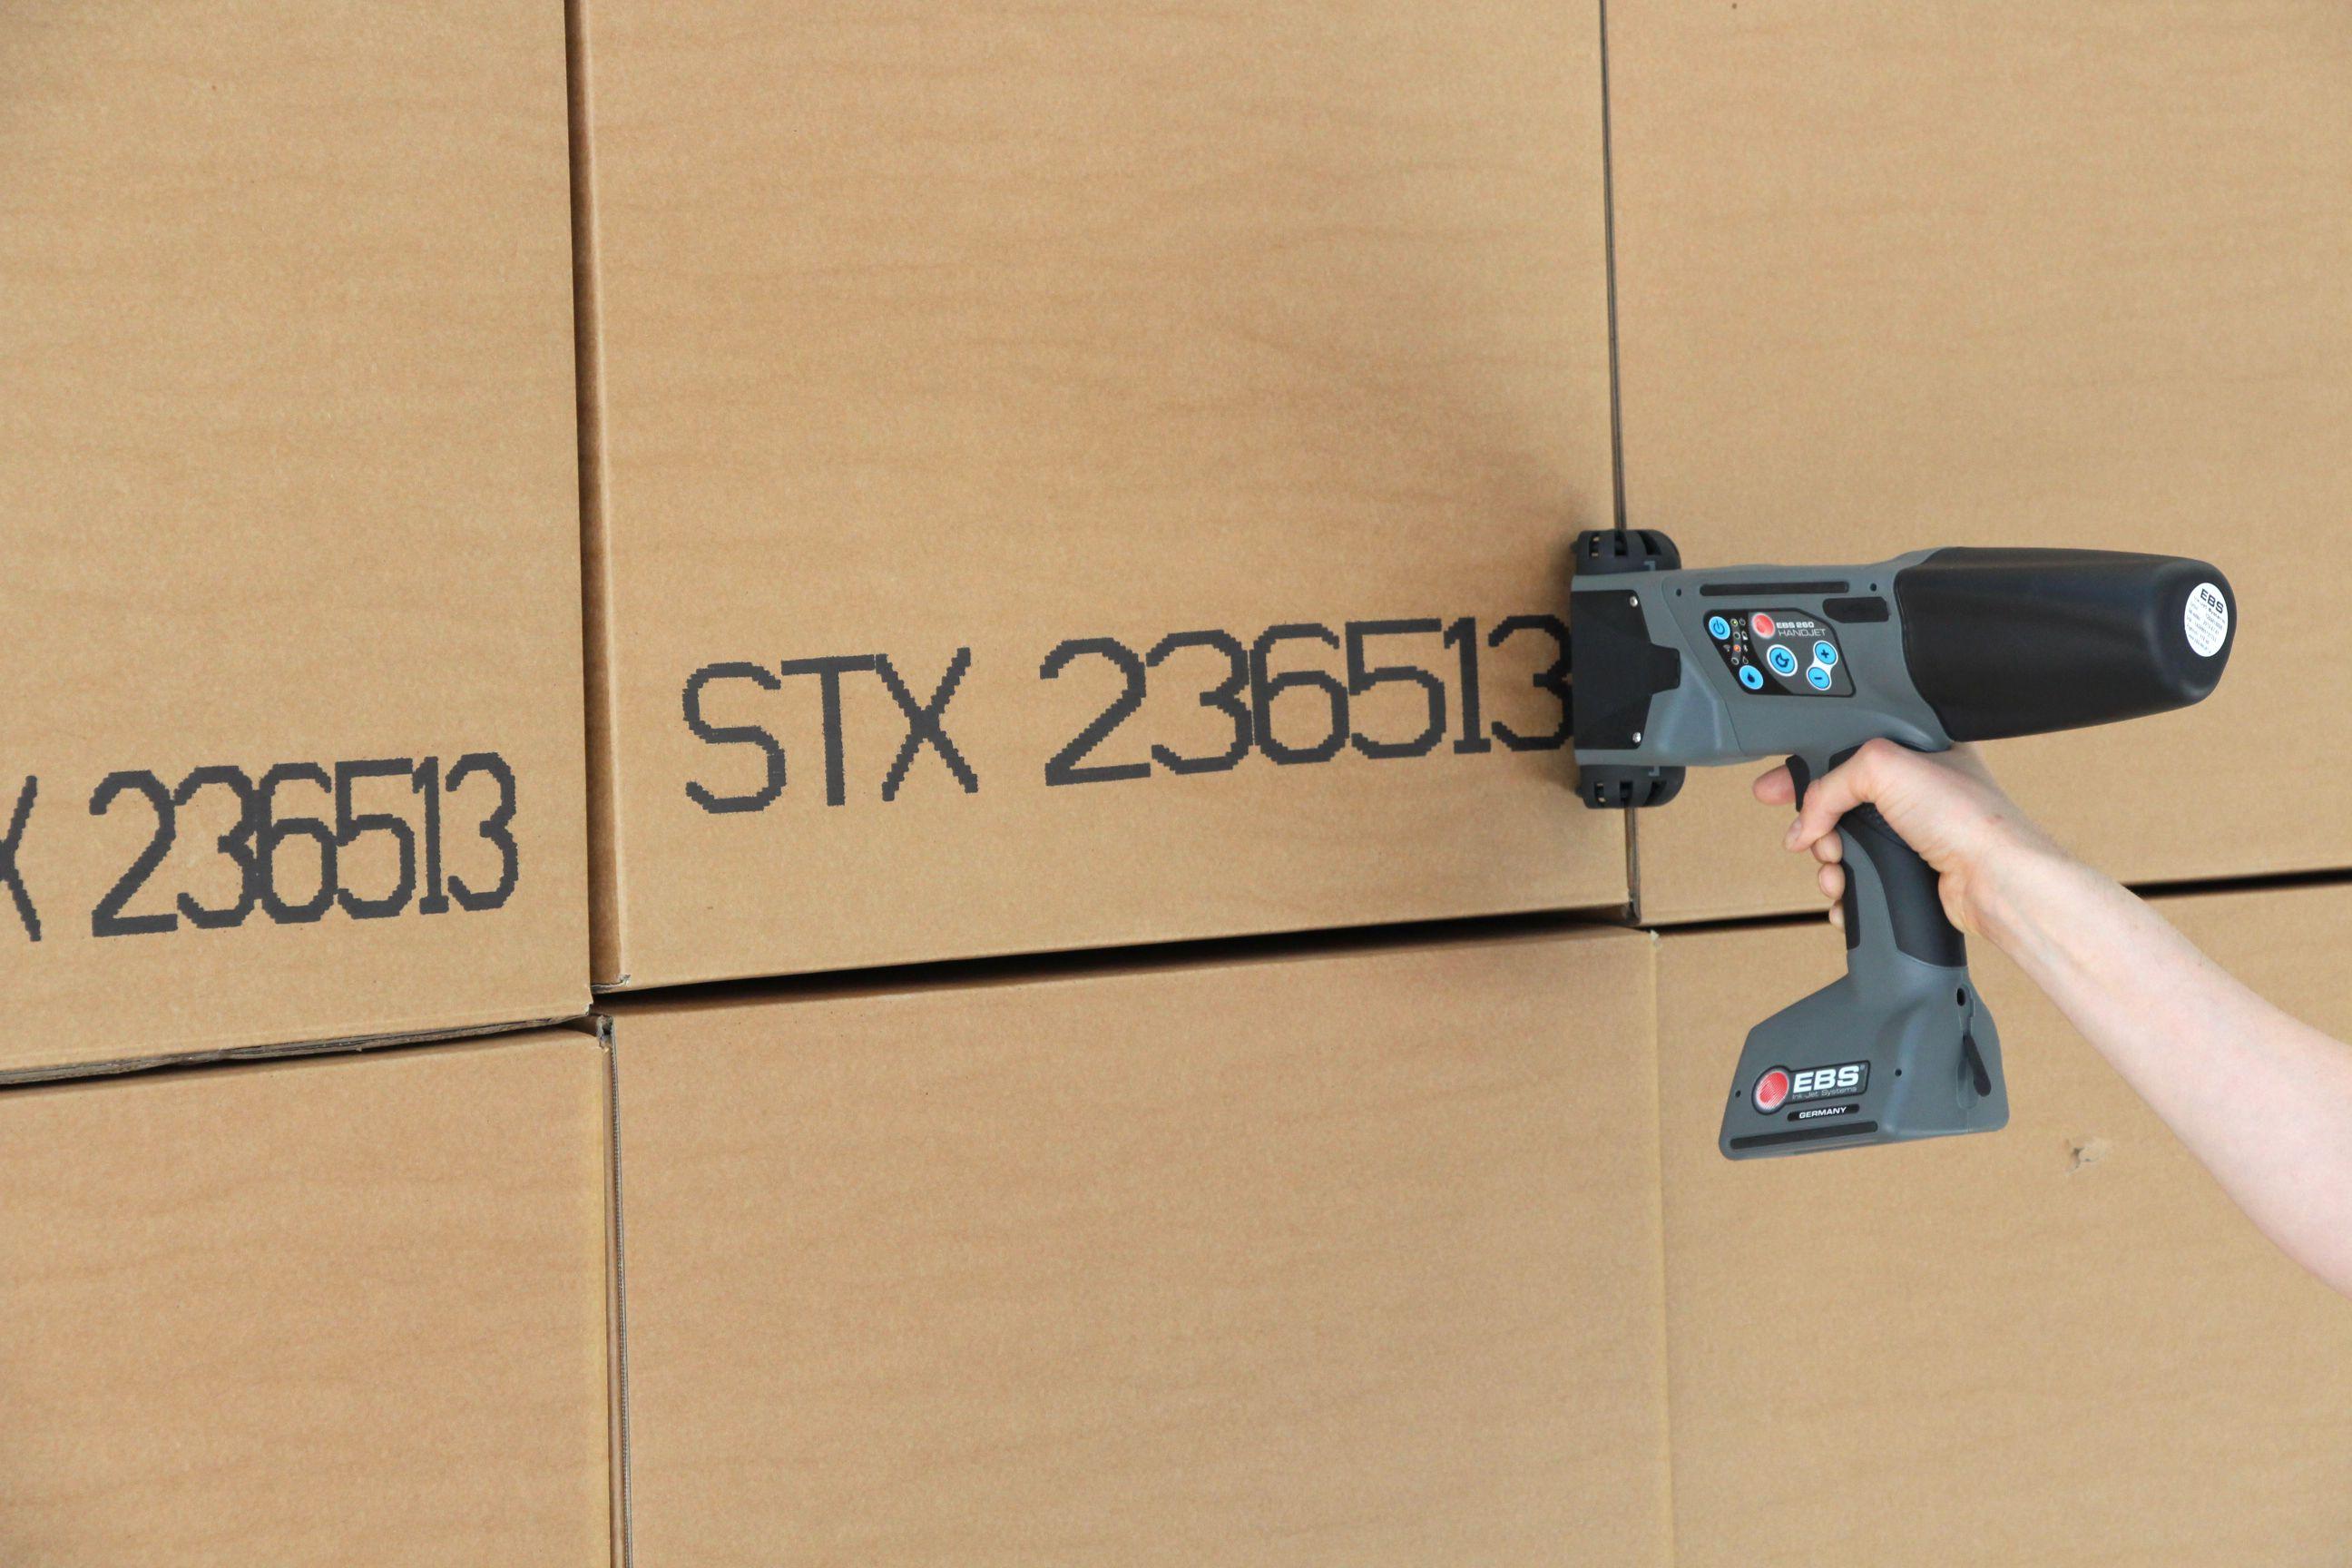 Picture Showing Handheld Inkjet Printer Printing On Cardboard